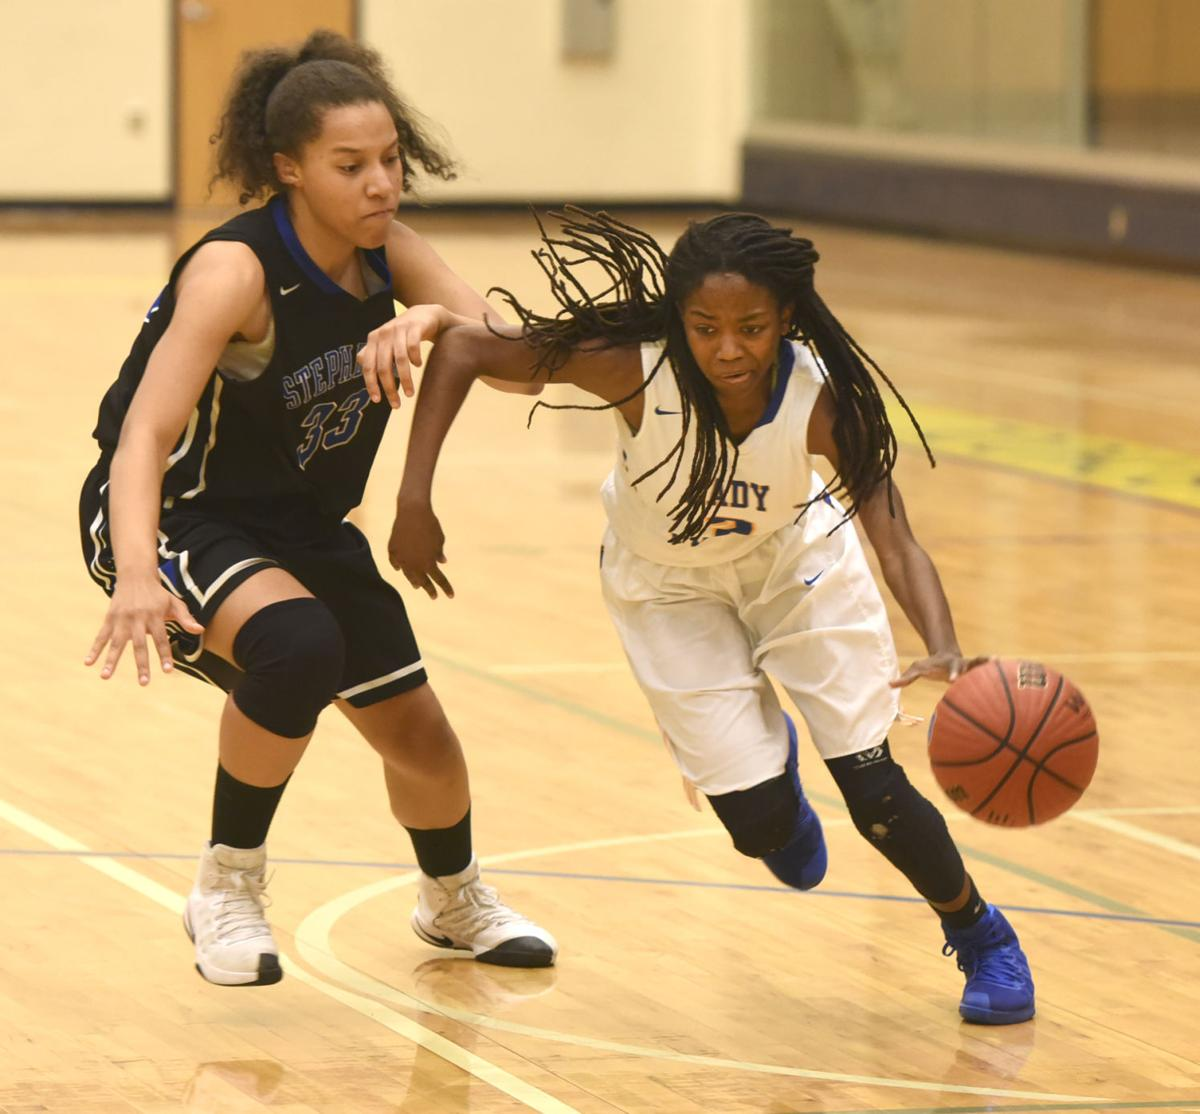 021817_bhs girls basketball 3